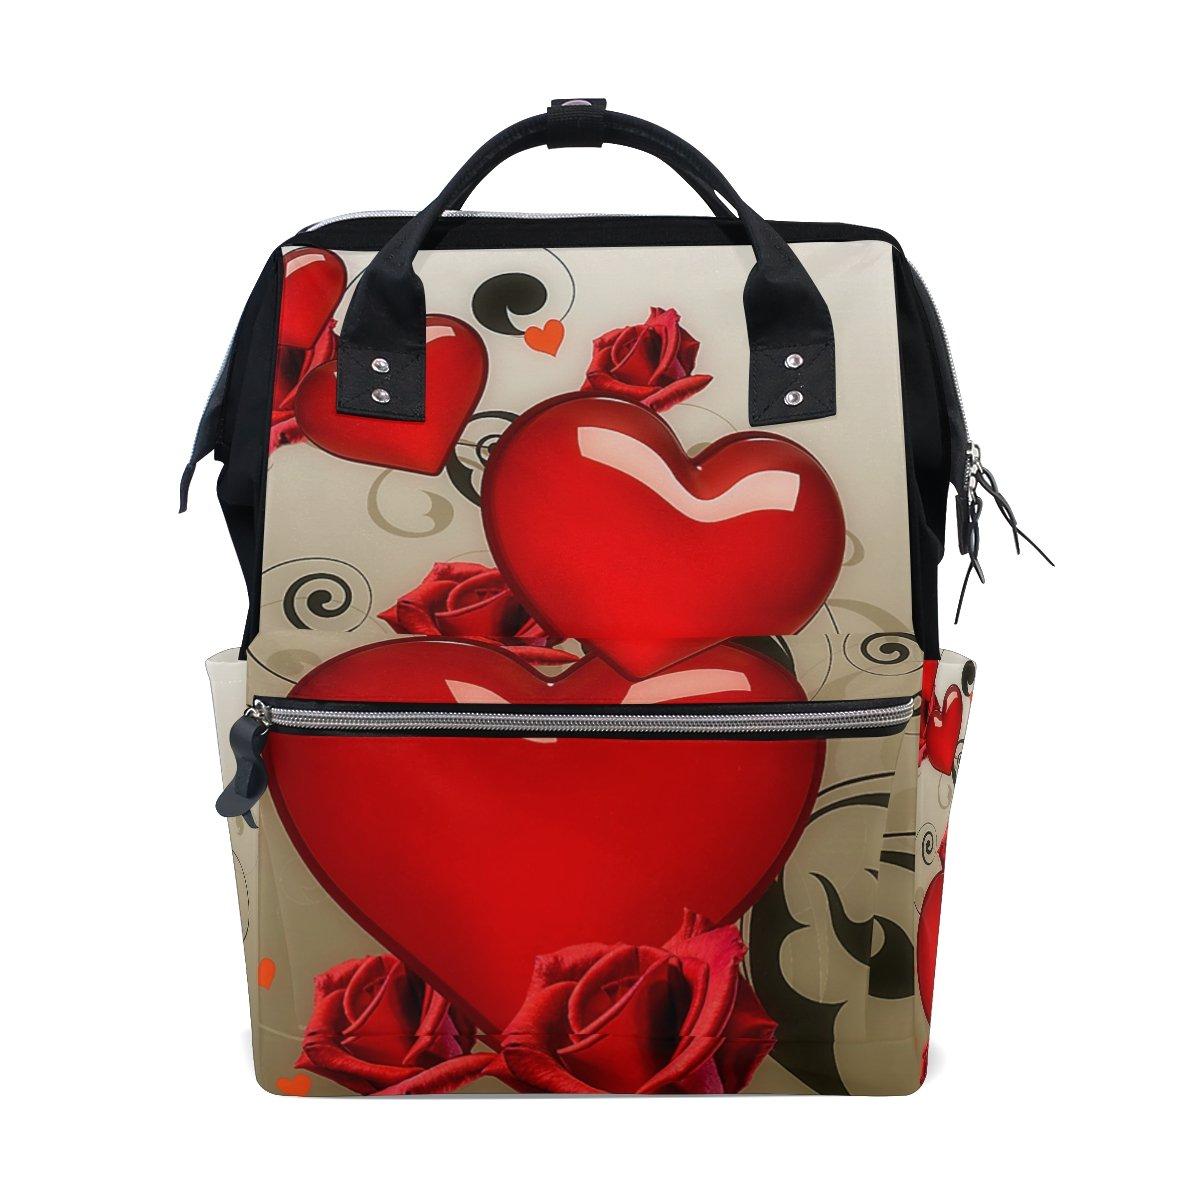 Backpack School Bag Wedding Rose Love Heart Canvas Travel Doctor Style Daypack